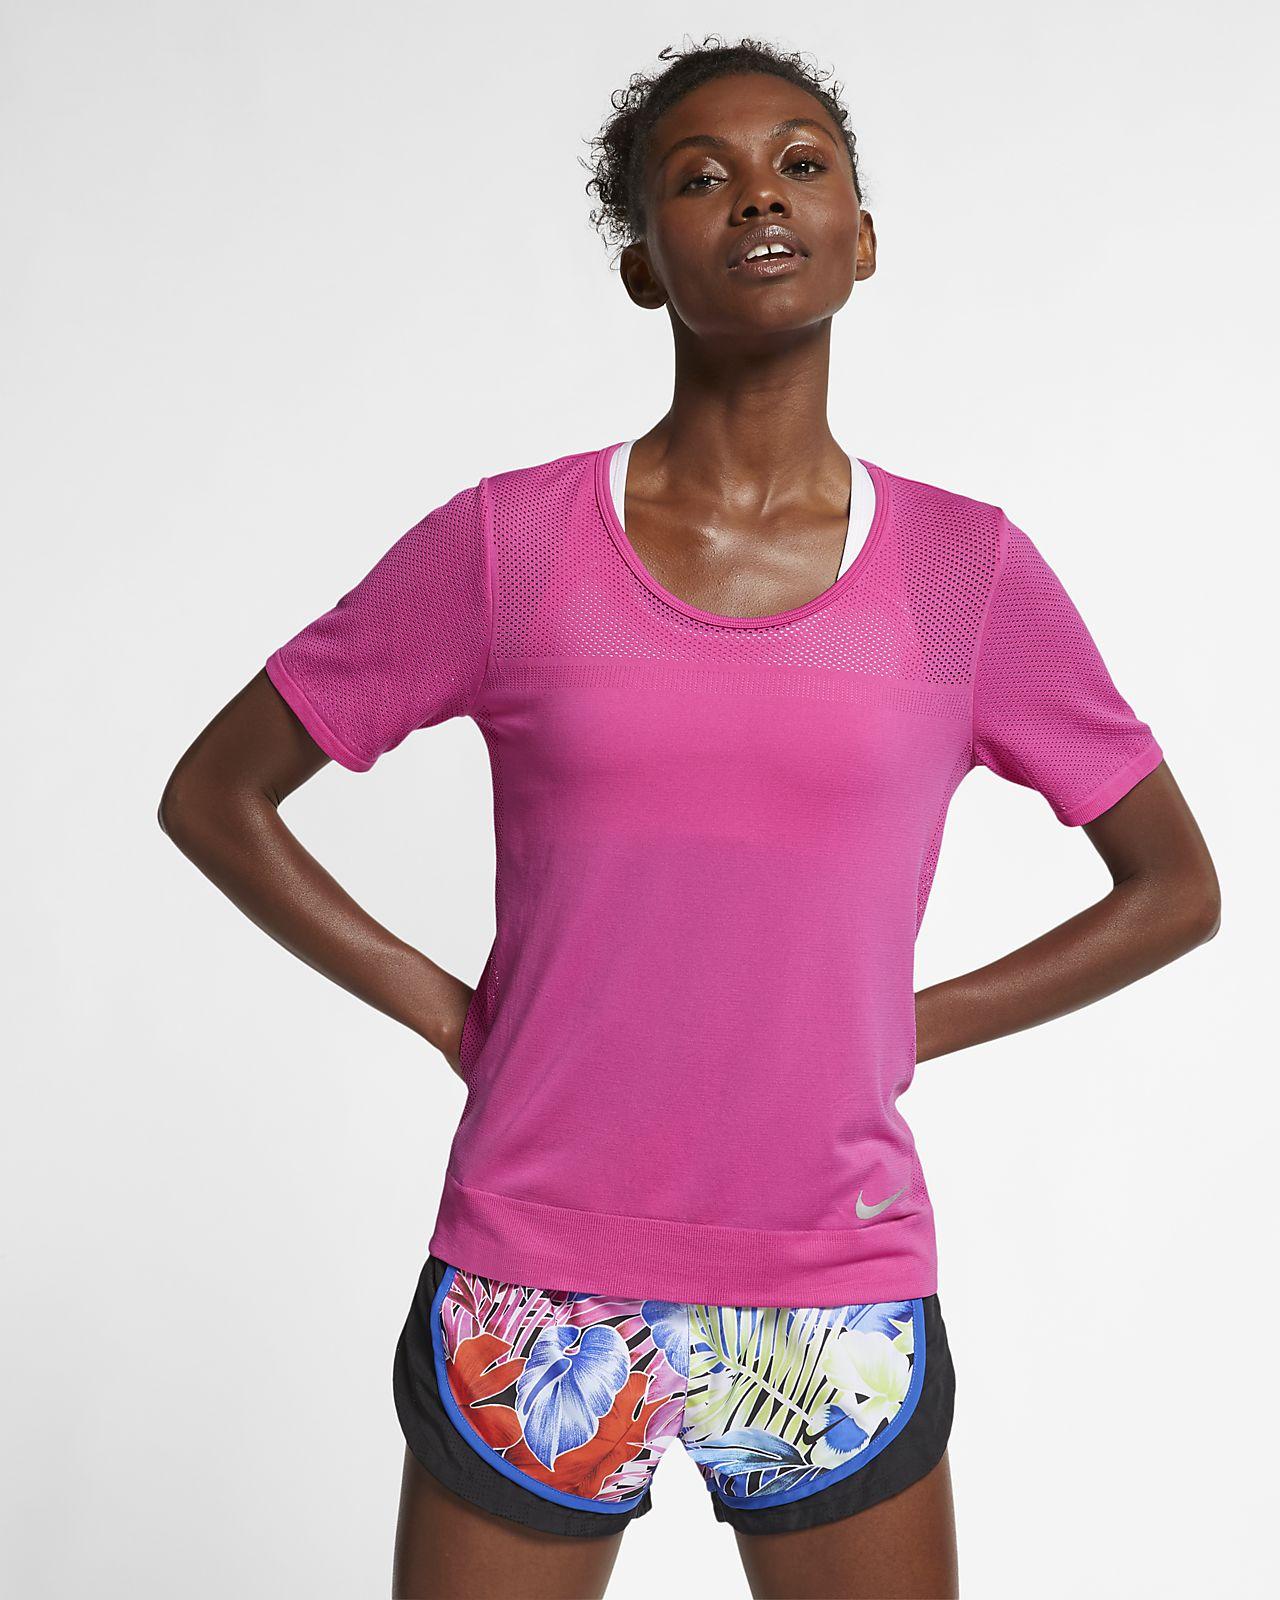 Kortärmad löpartröja Nike Infinite för kvinnor